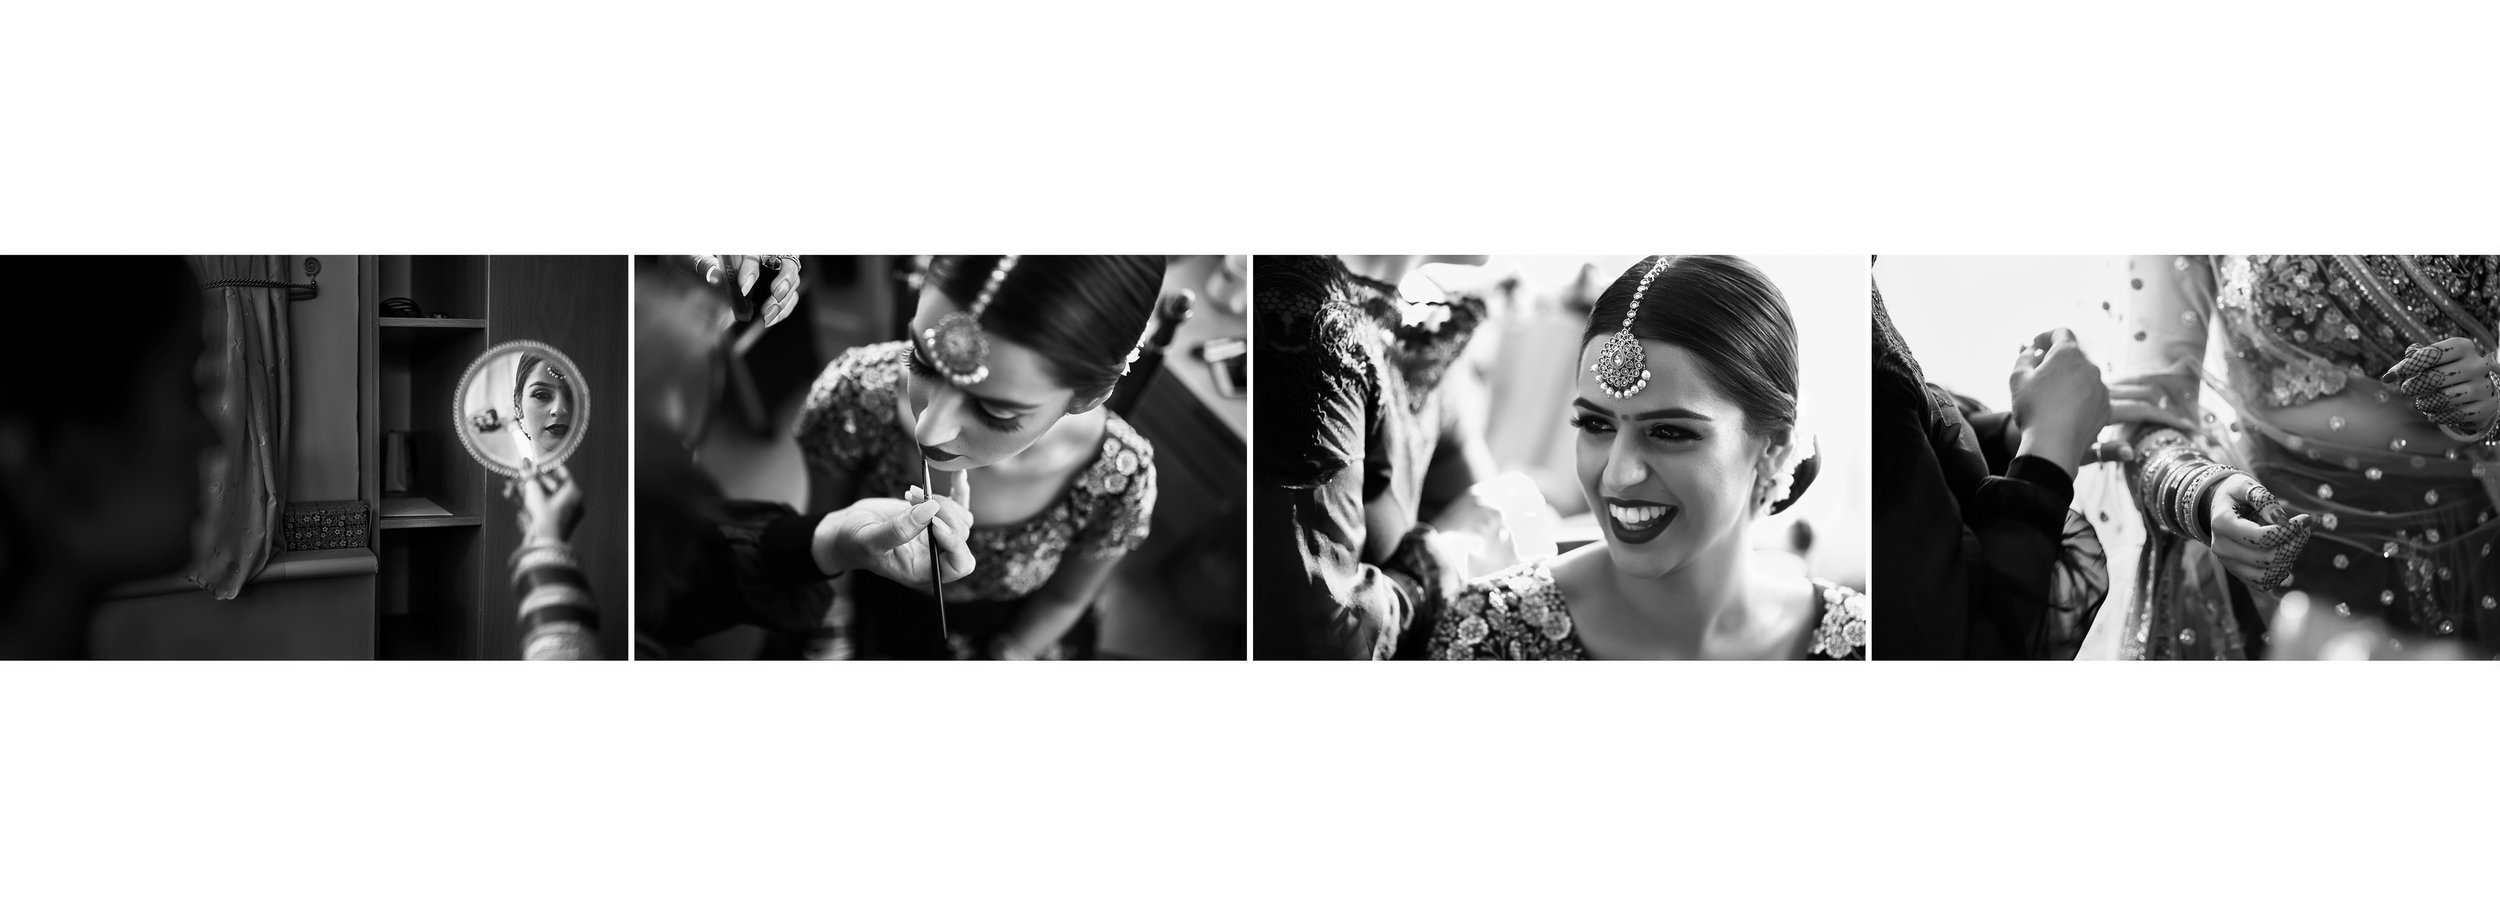 Sikh Wedding Album spread 4 - bride getting makeup